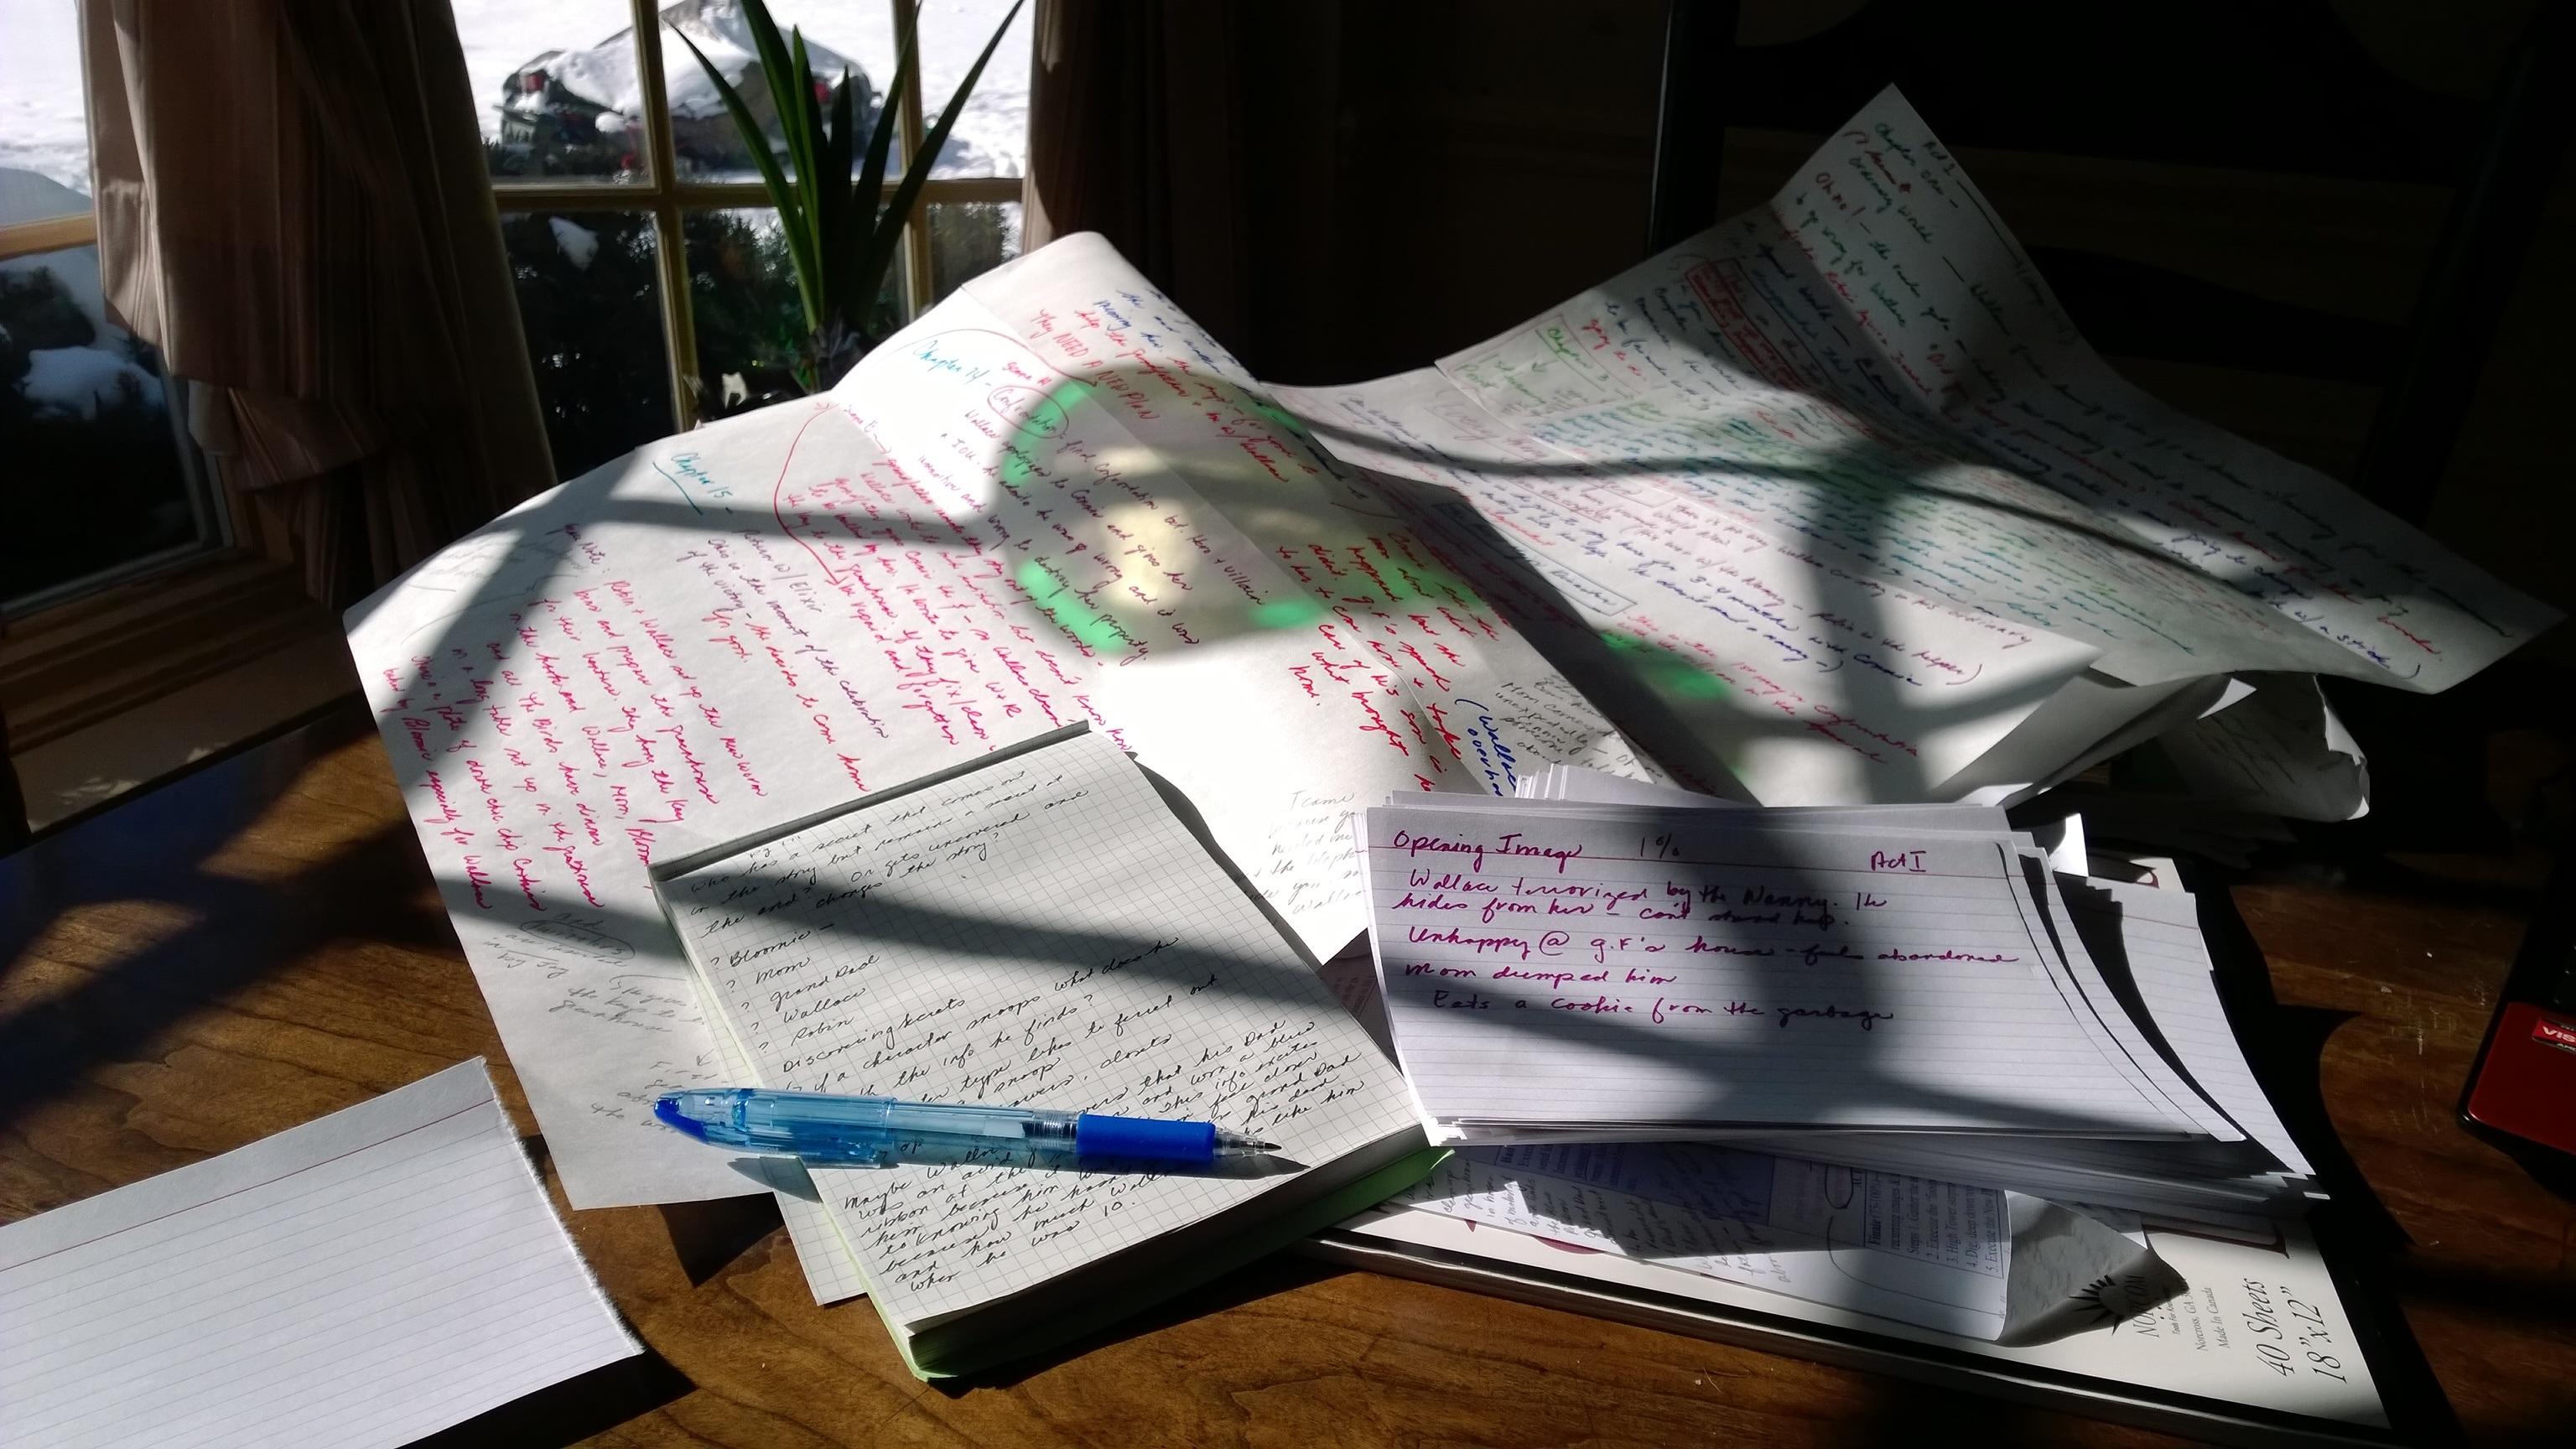 Free Images Desk Writing Table Book Novel Creative Pen Journal Letter Clothing Paper